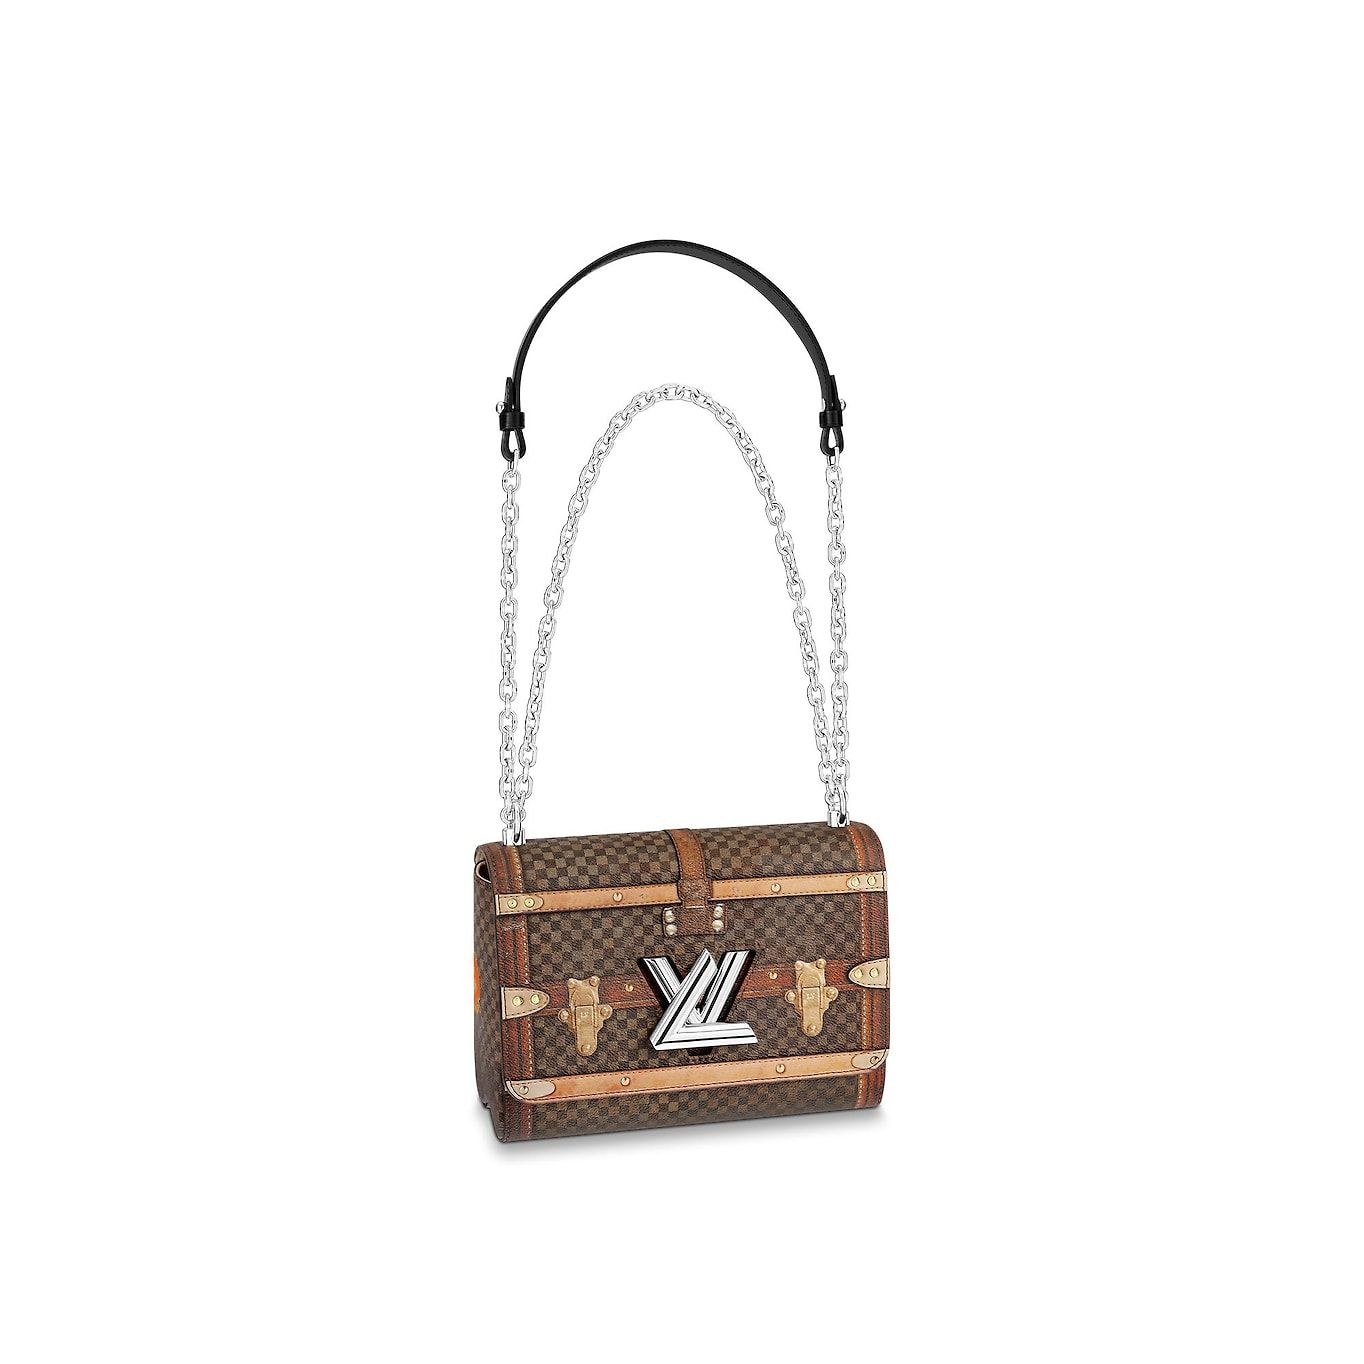 Twist Mm Louis Vuitton Louis Vuitton Twist Bag Vuitton